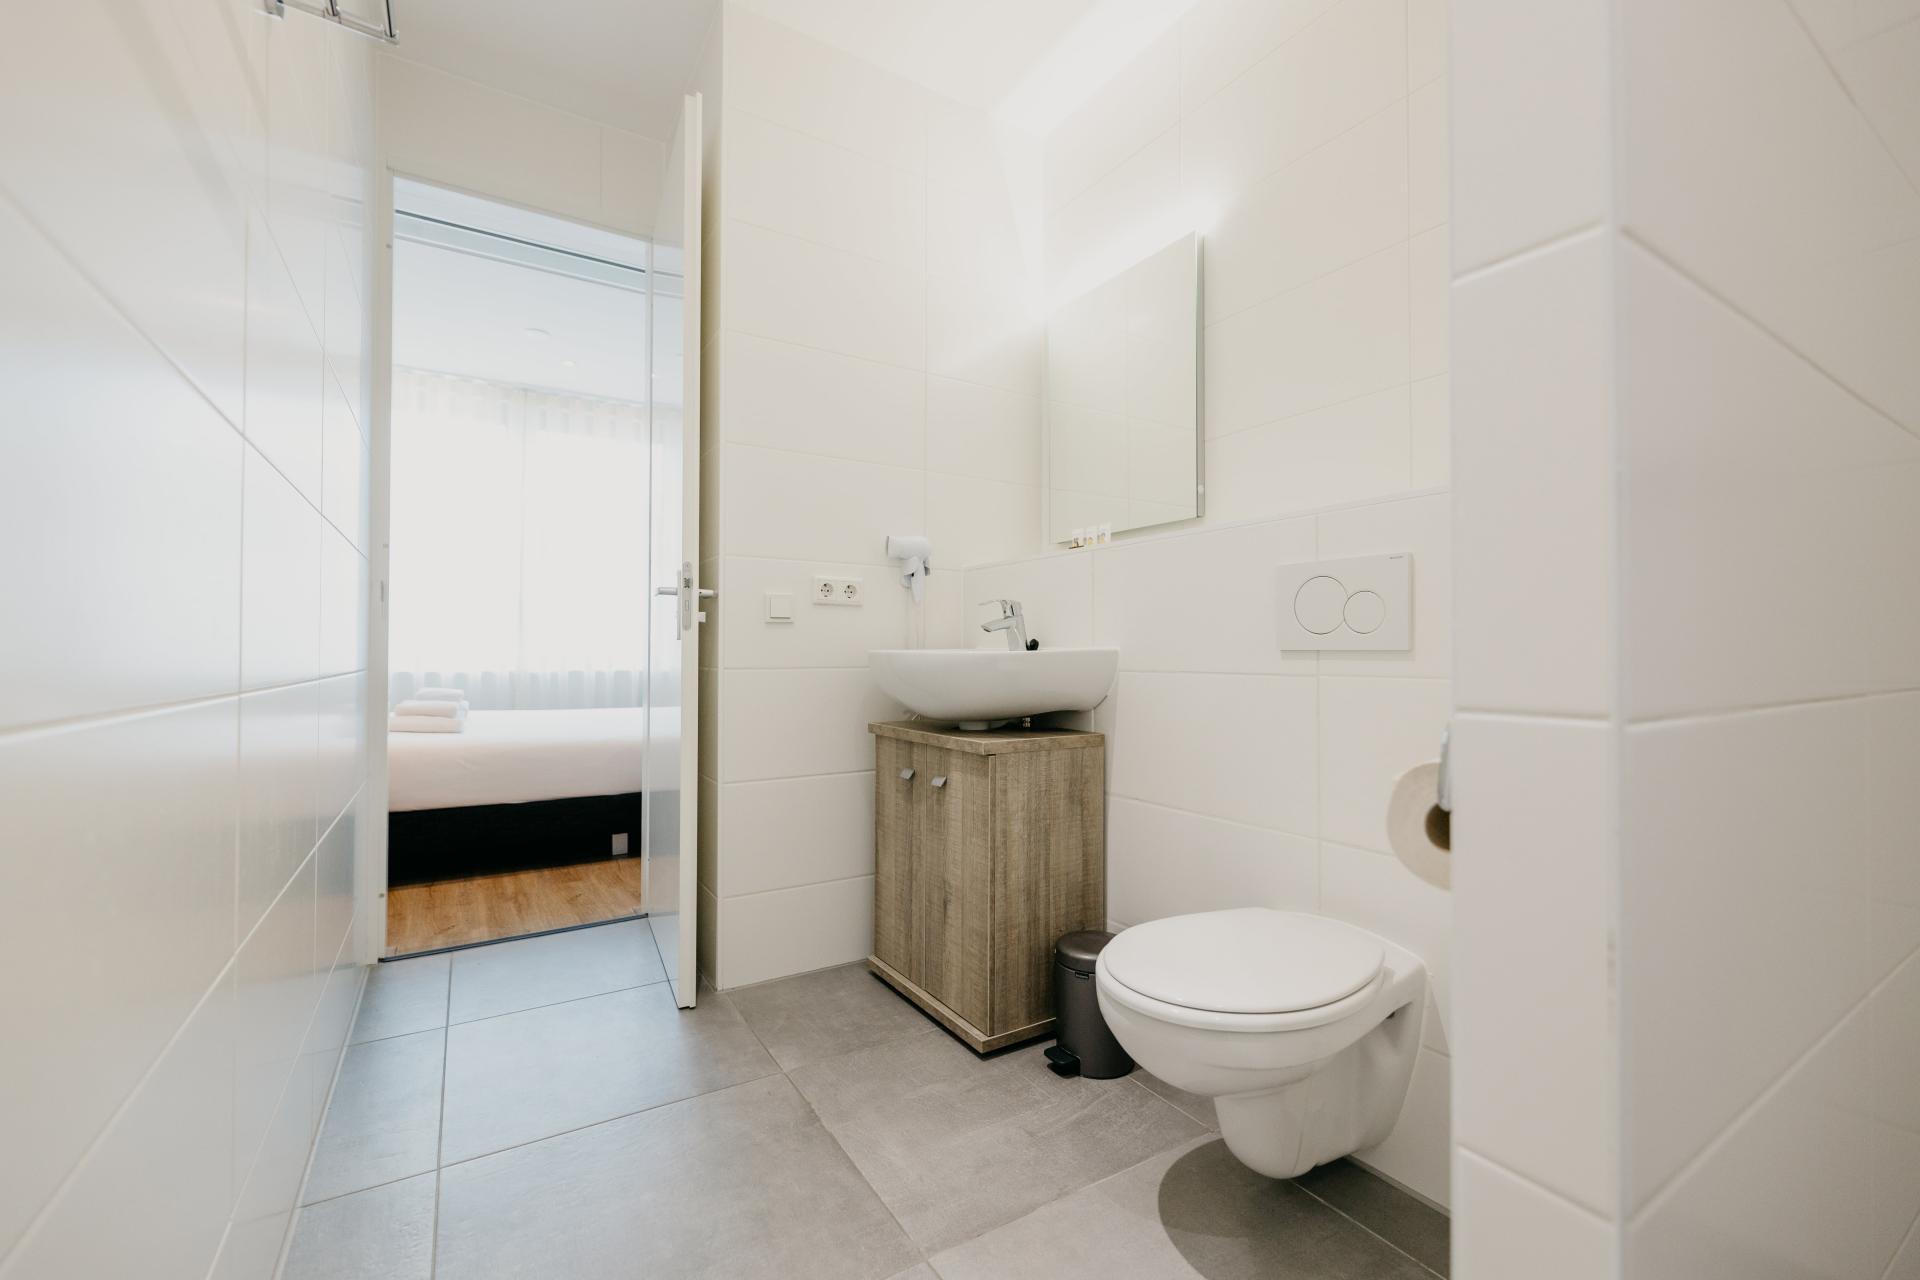 WC at Amsterdam ID Aparthotel, Sloterdijk, Amsterdam